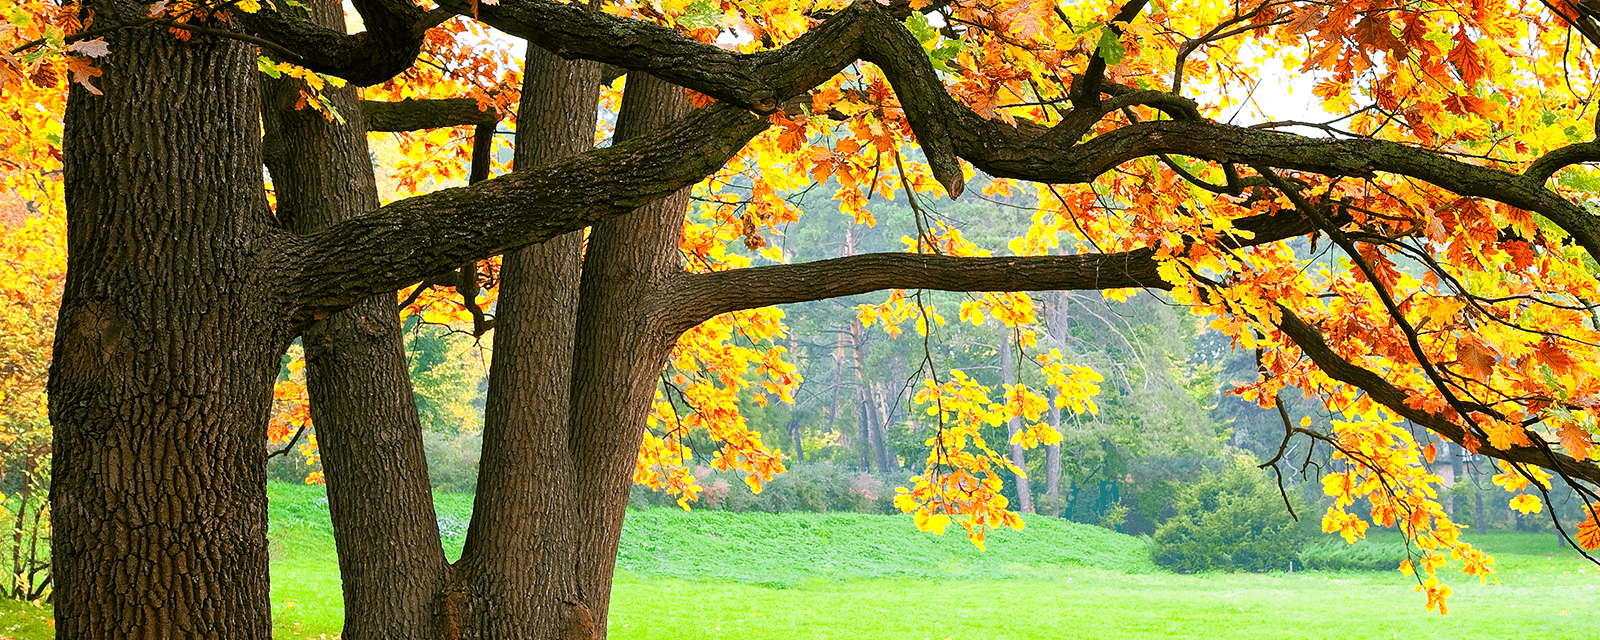 outco tree services